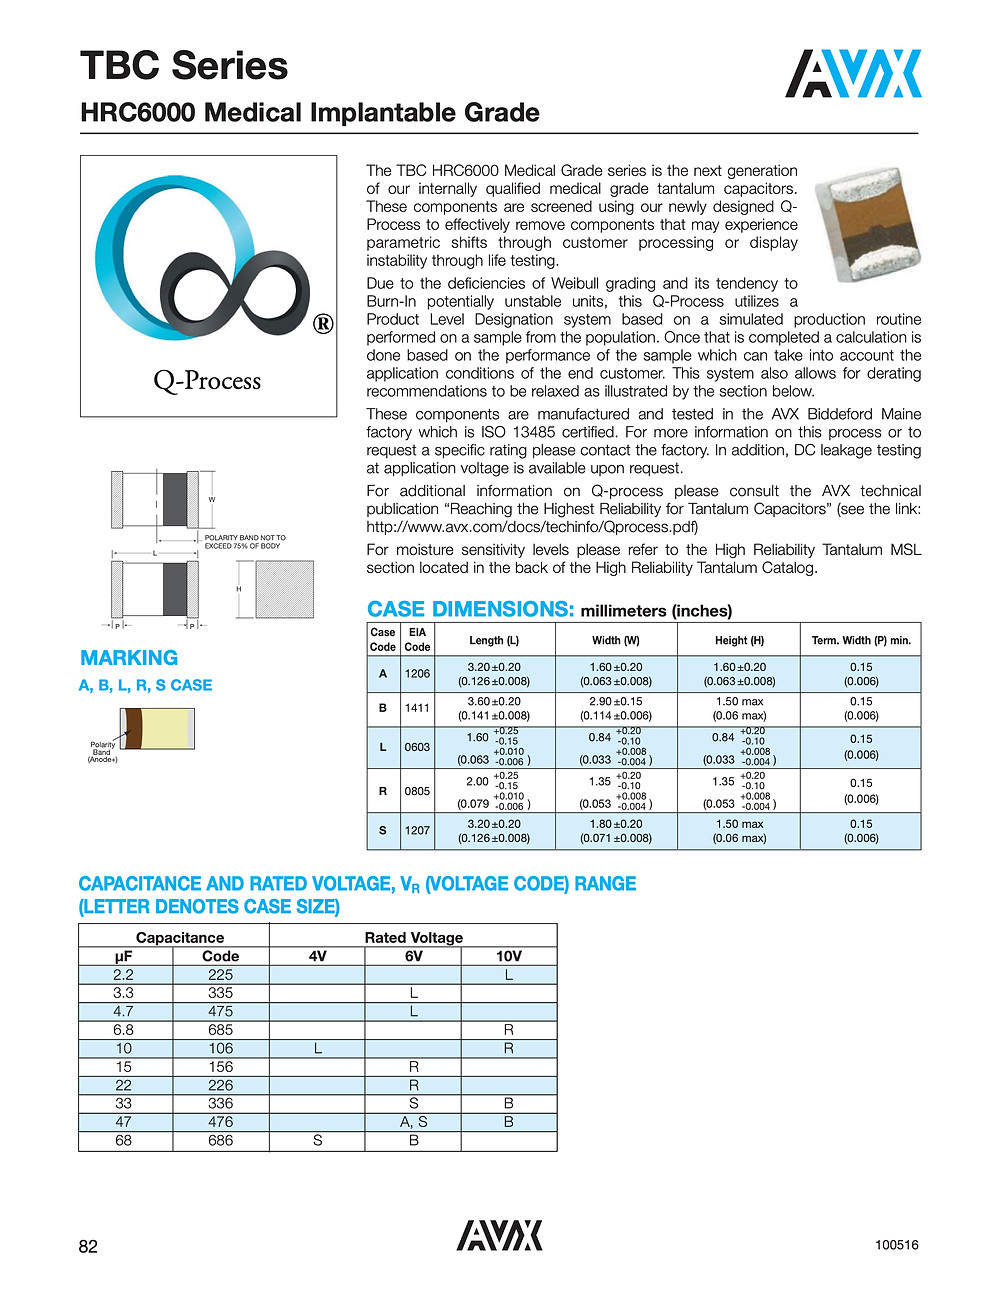 AVX TBC HRC6000 Series Capacitor